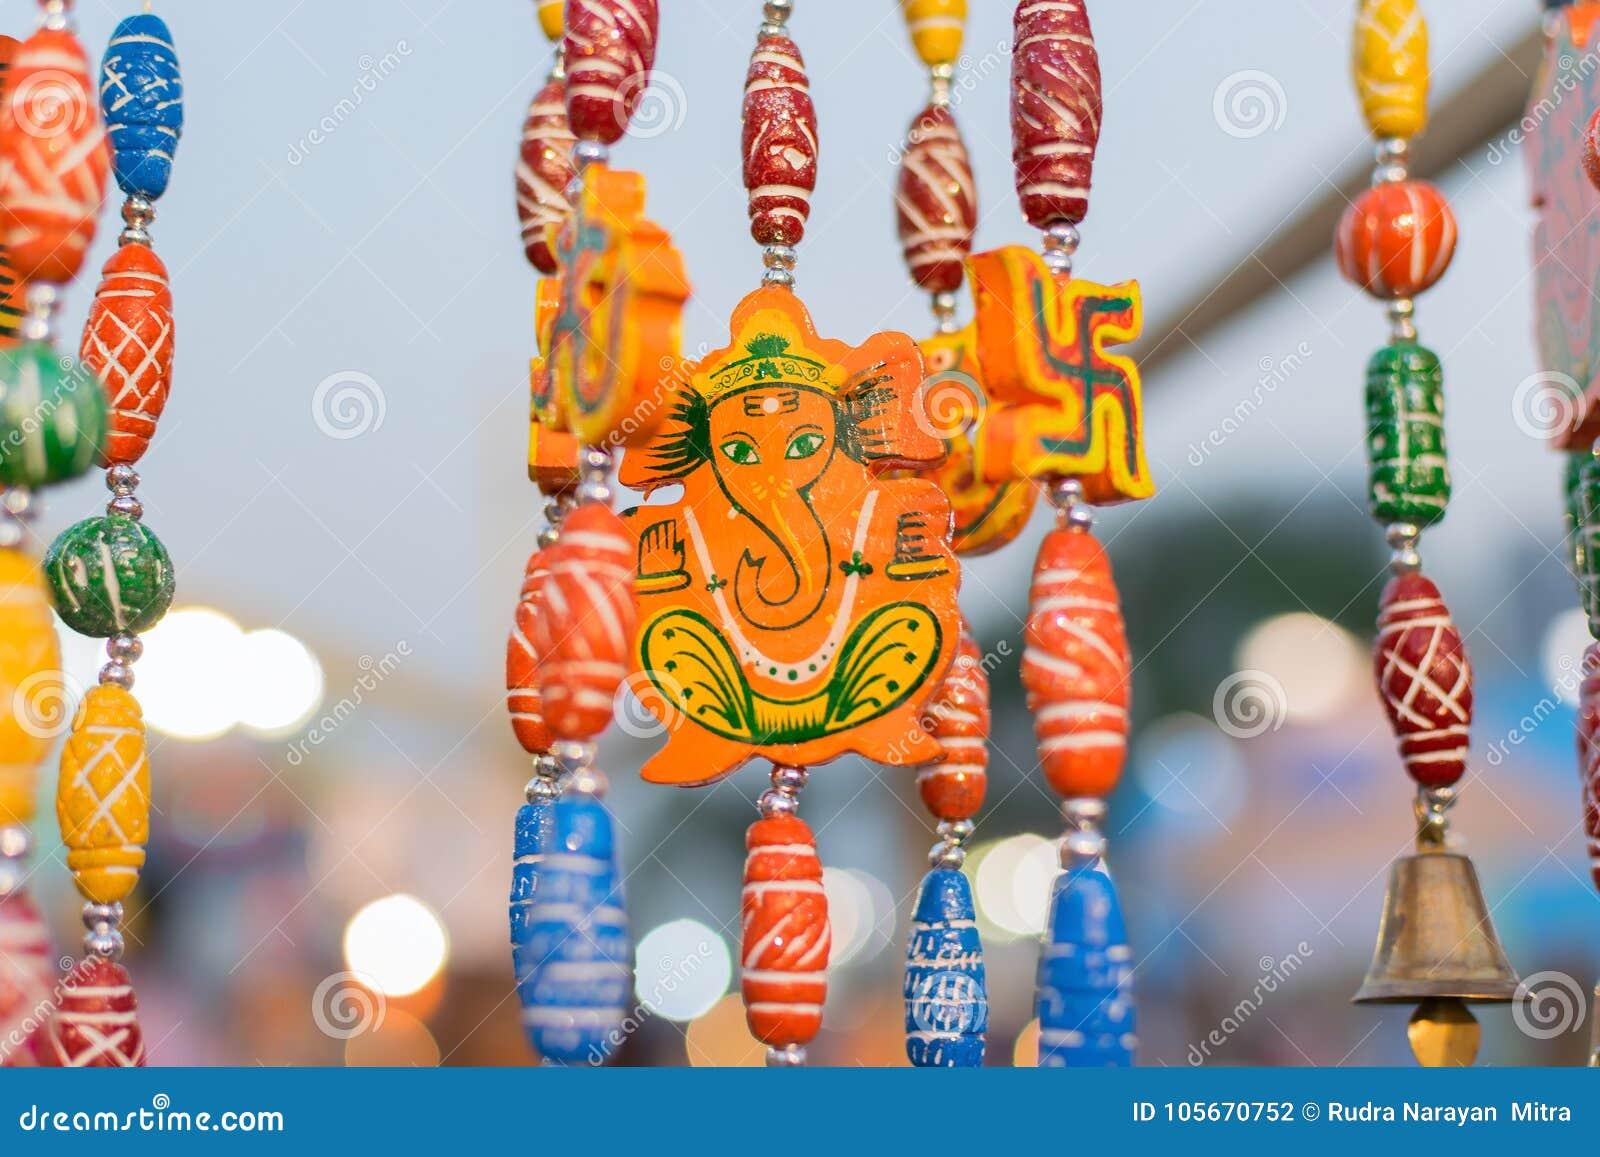 Lord Ganesha Dolls Art Work Indian Handicrafts Fair At Kolkata